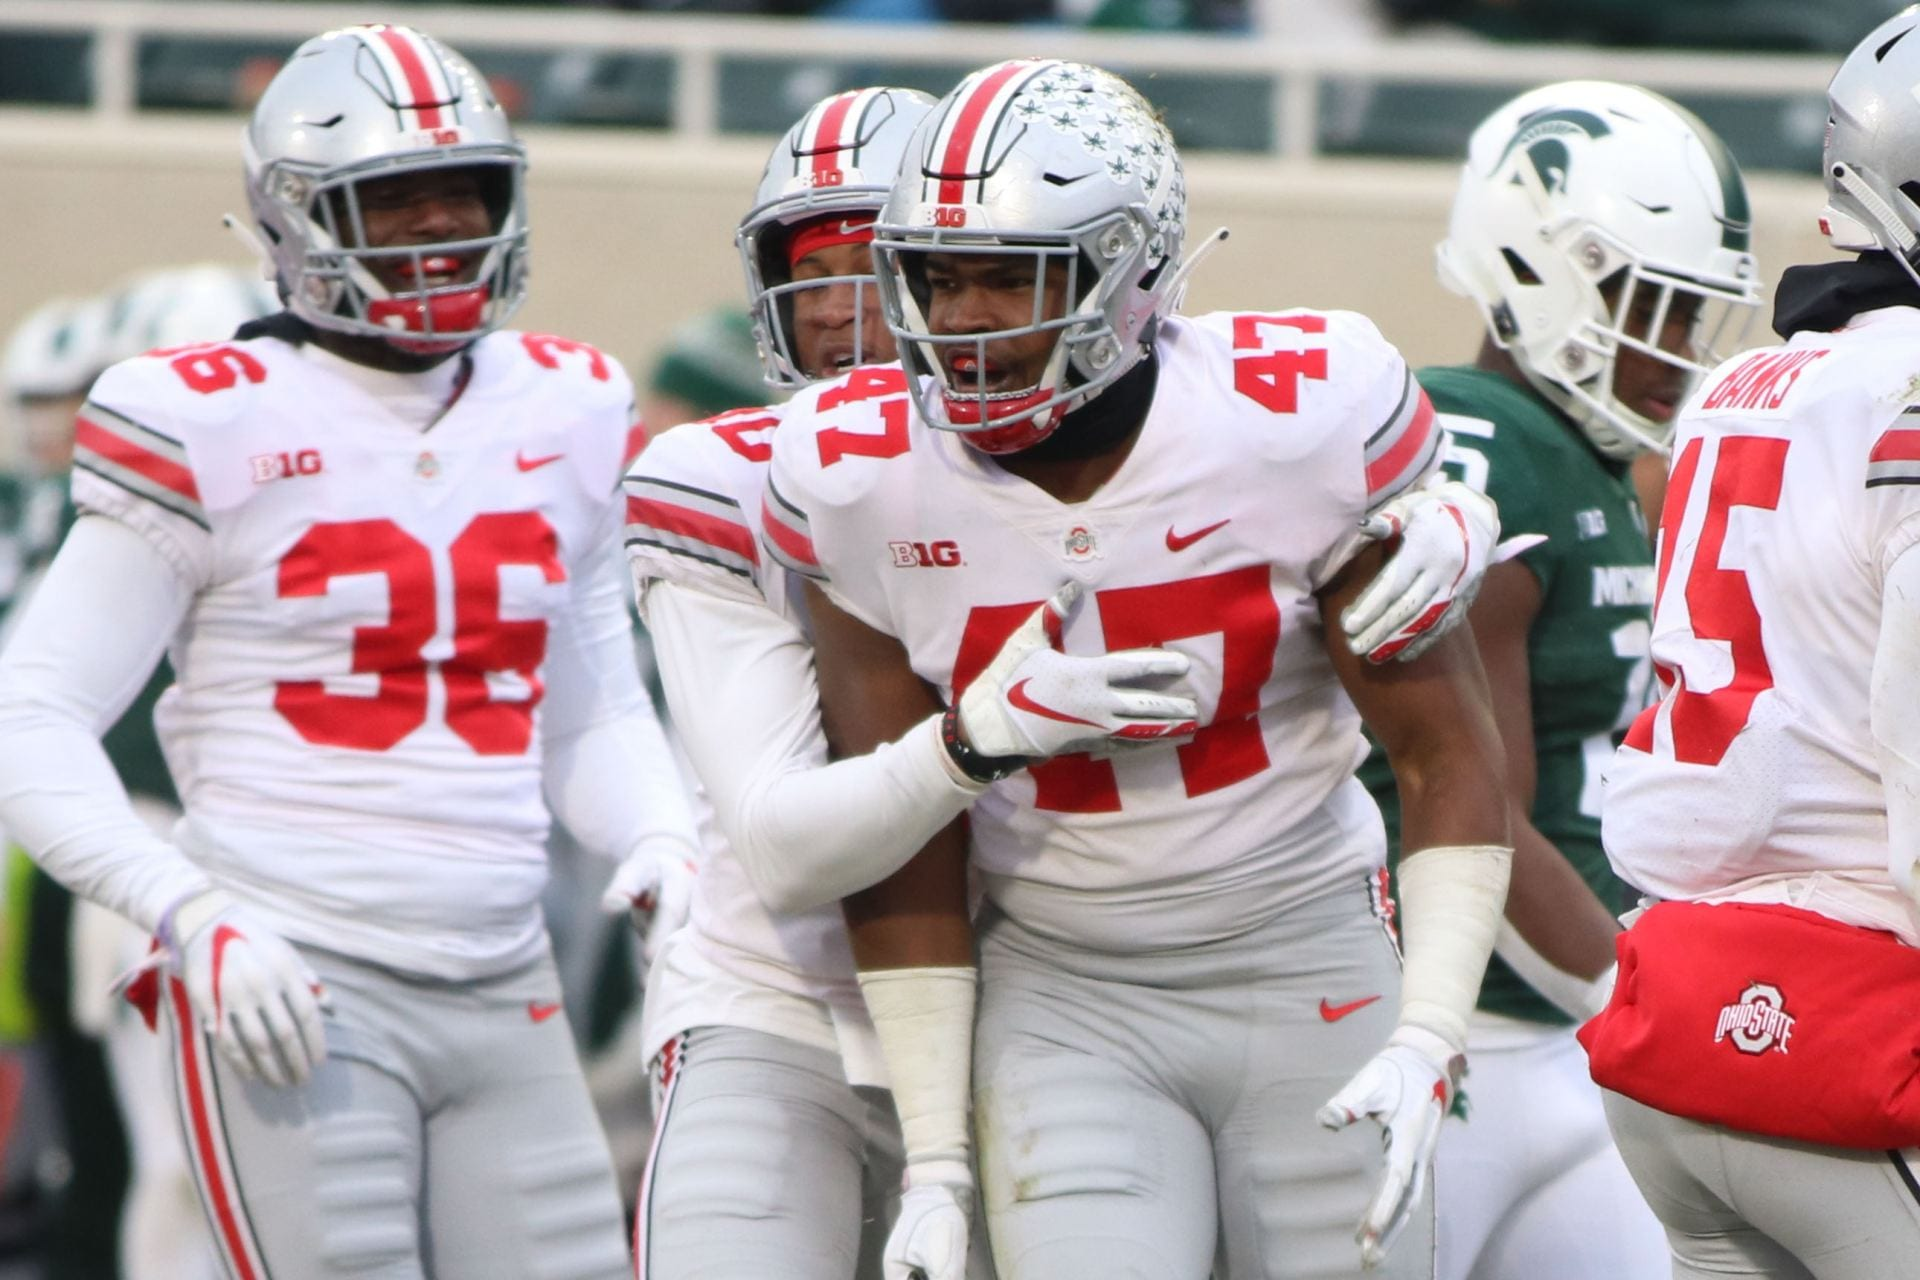 on sale 896e0 ec322 Football: No. 10 Ohio State faces toughest pass defense yet ...